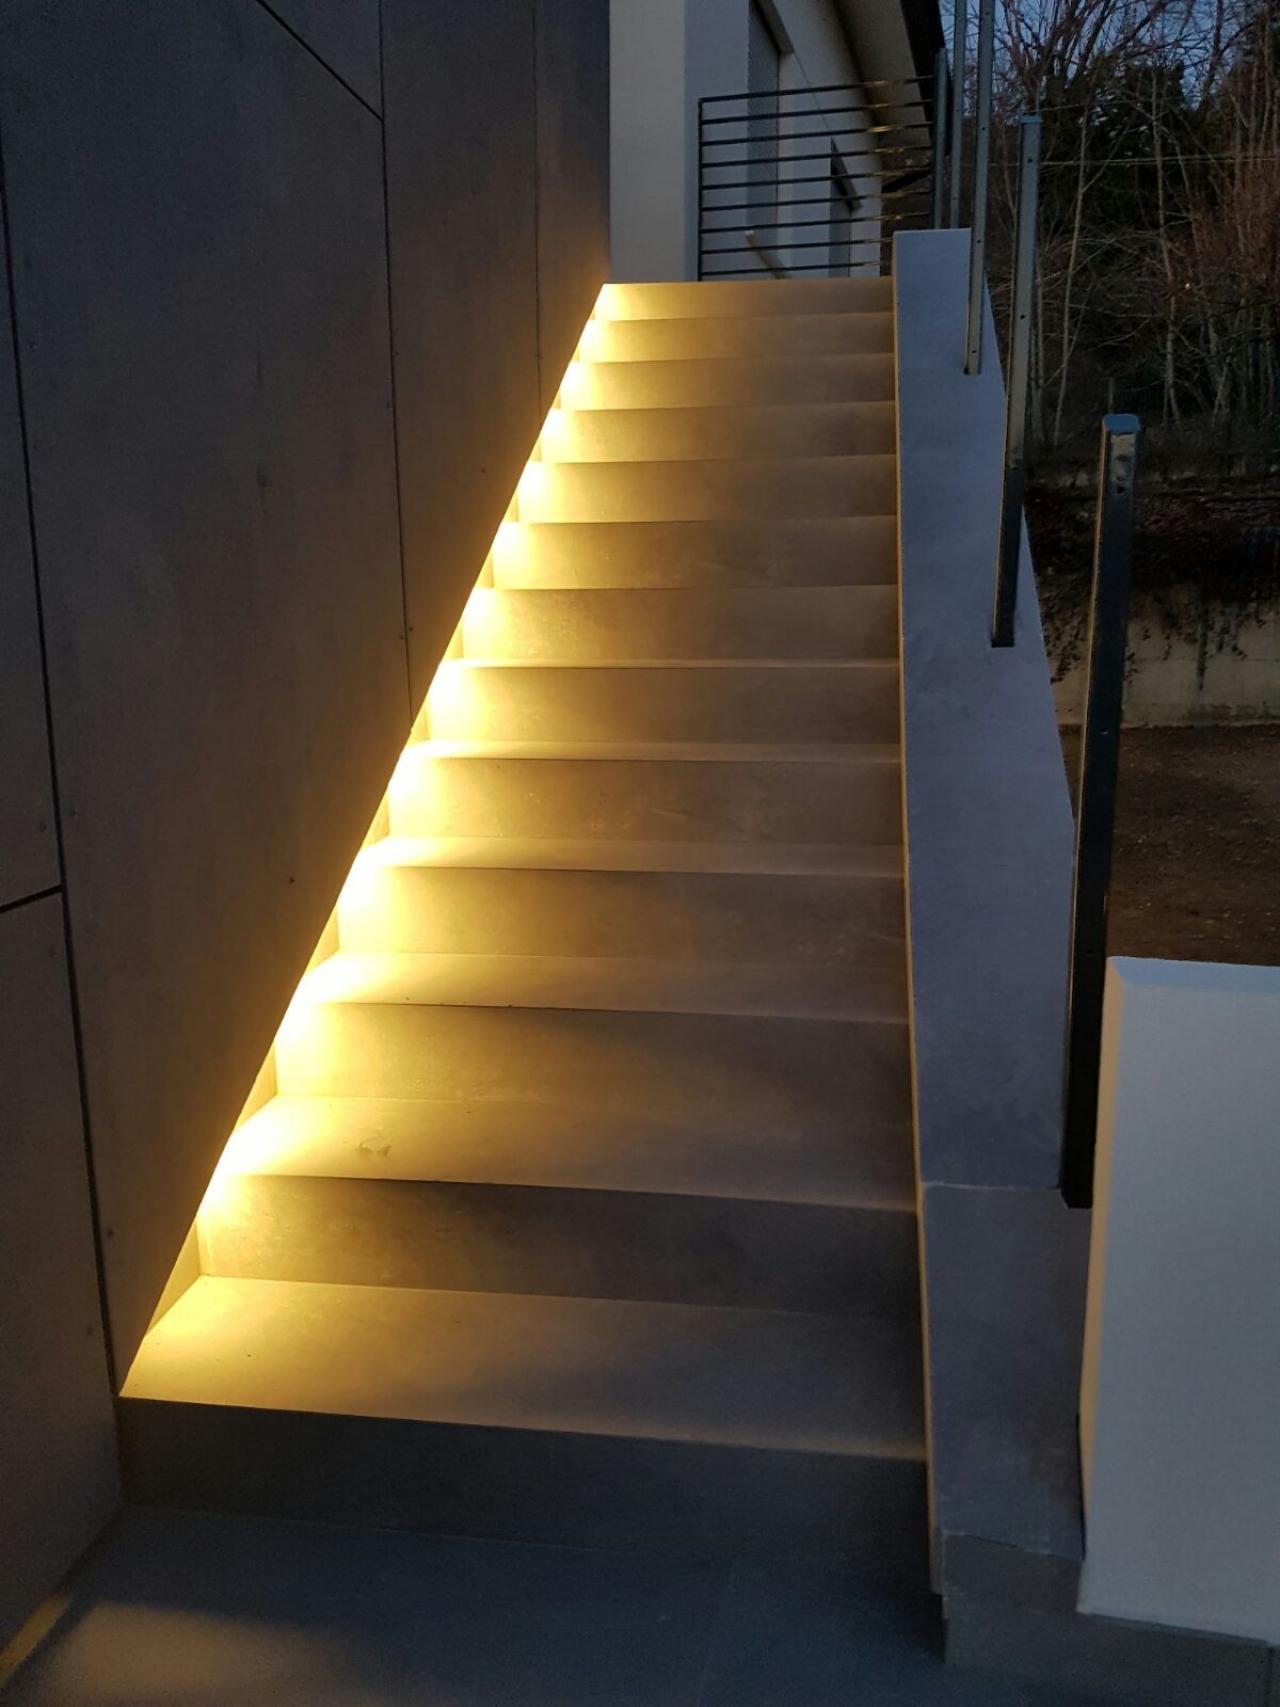 Scale interne di case tra vicenza e verona fratelli pellizzari - Case illuminazione scala interna ...